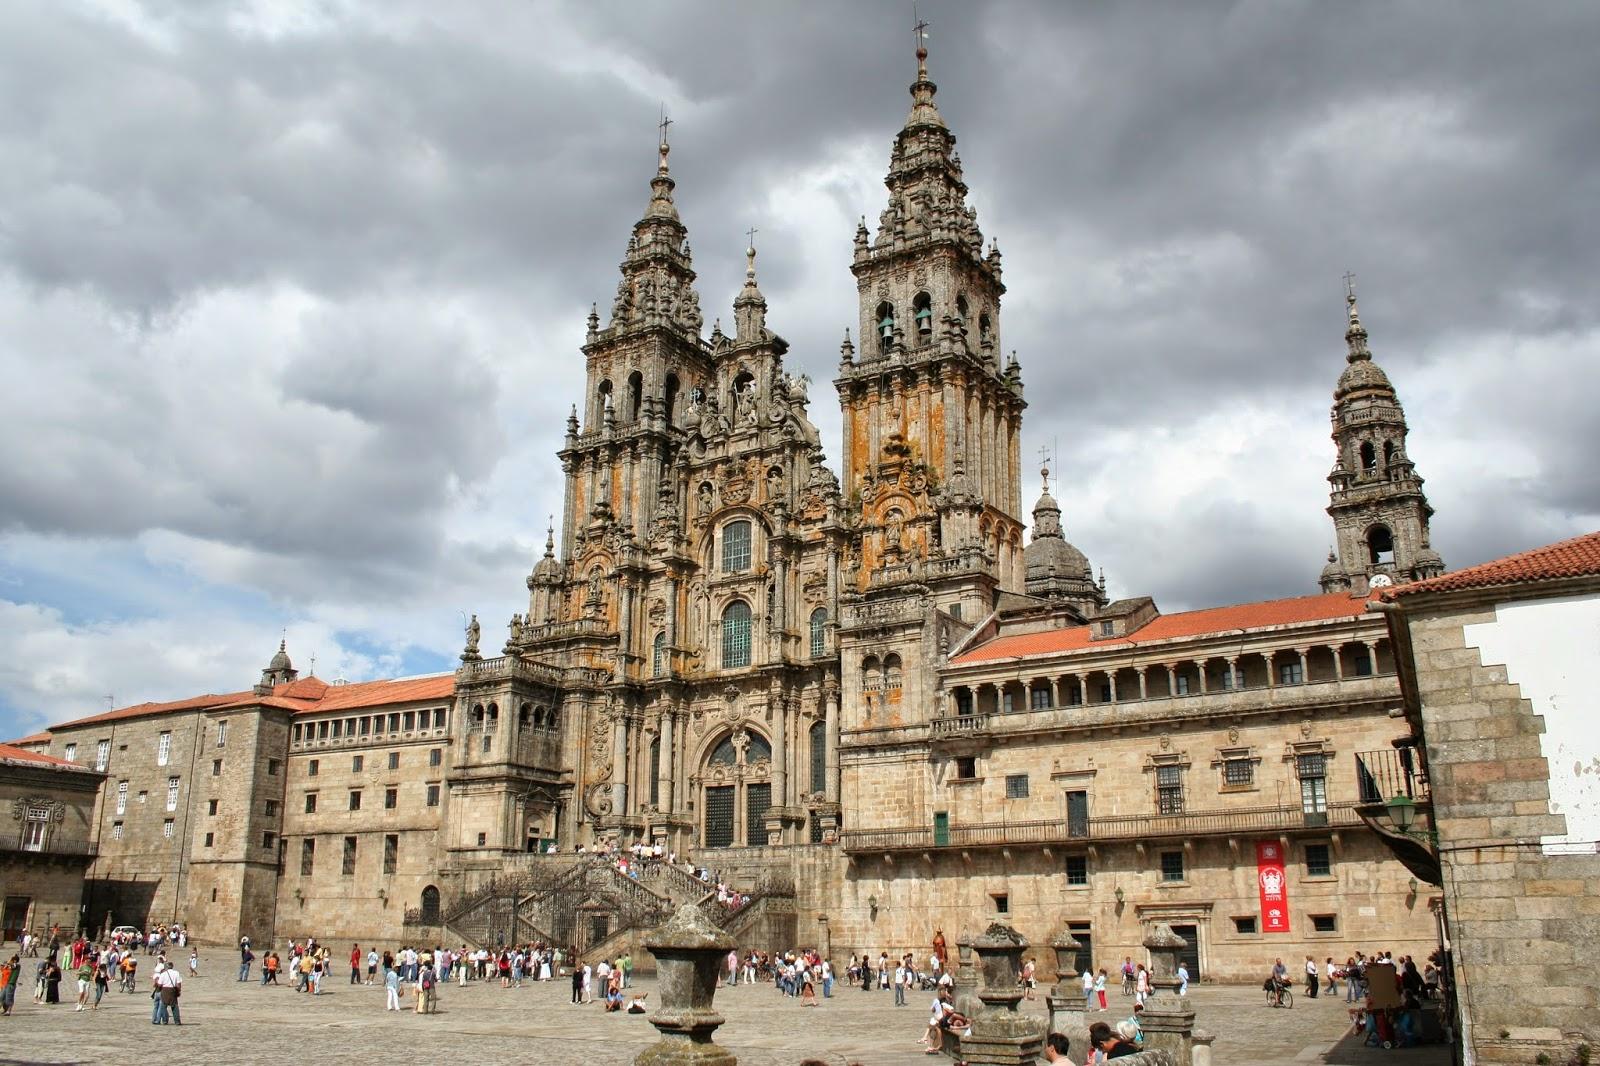 Hoteles en Galicia - Santiago de Compostela